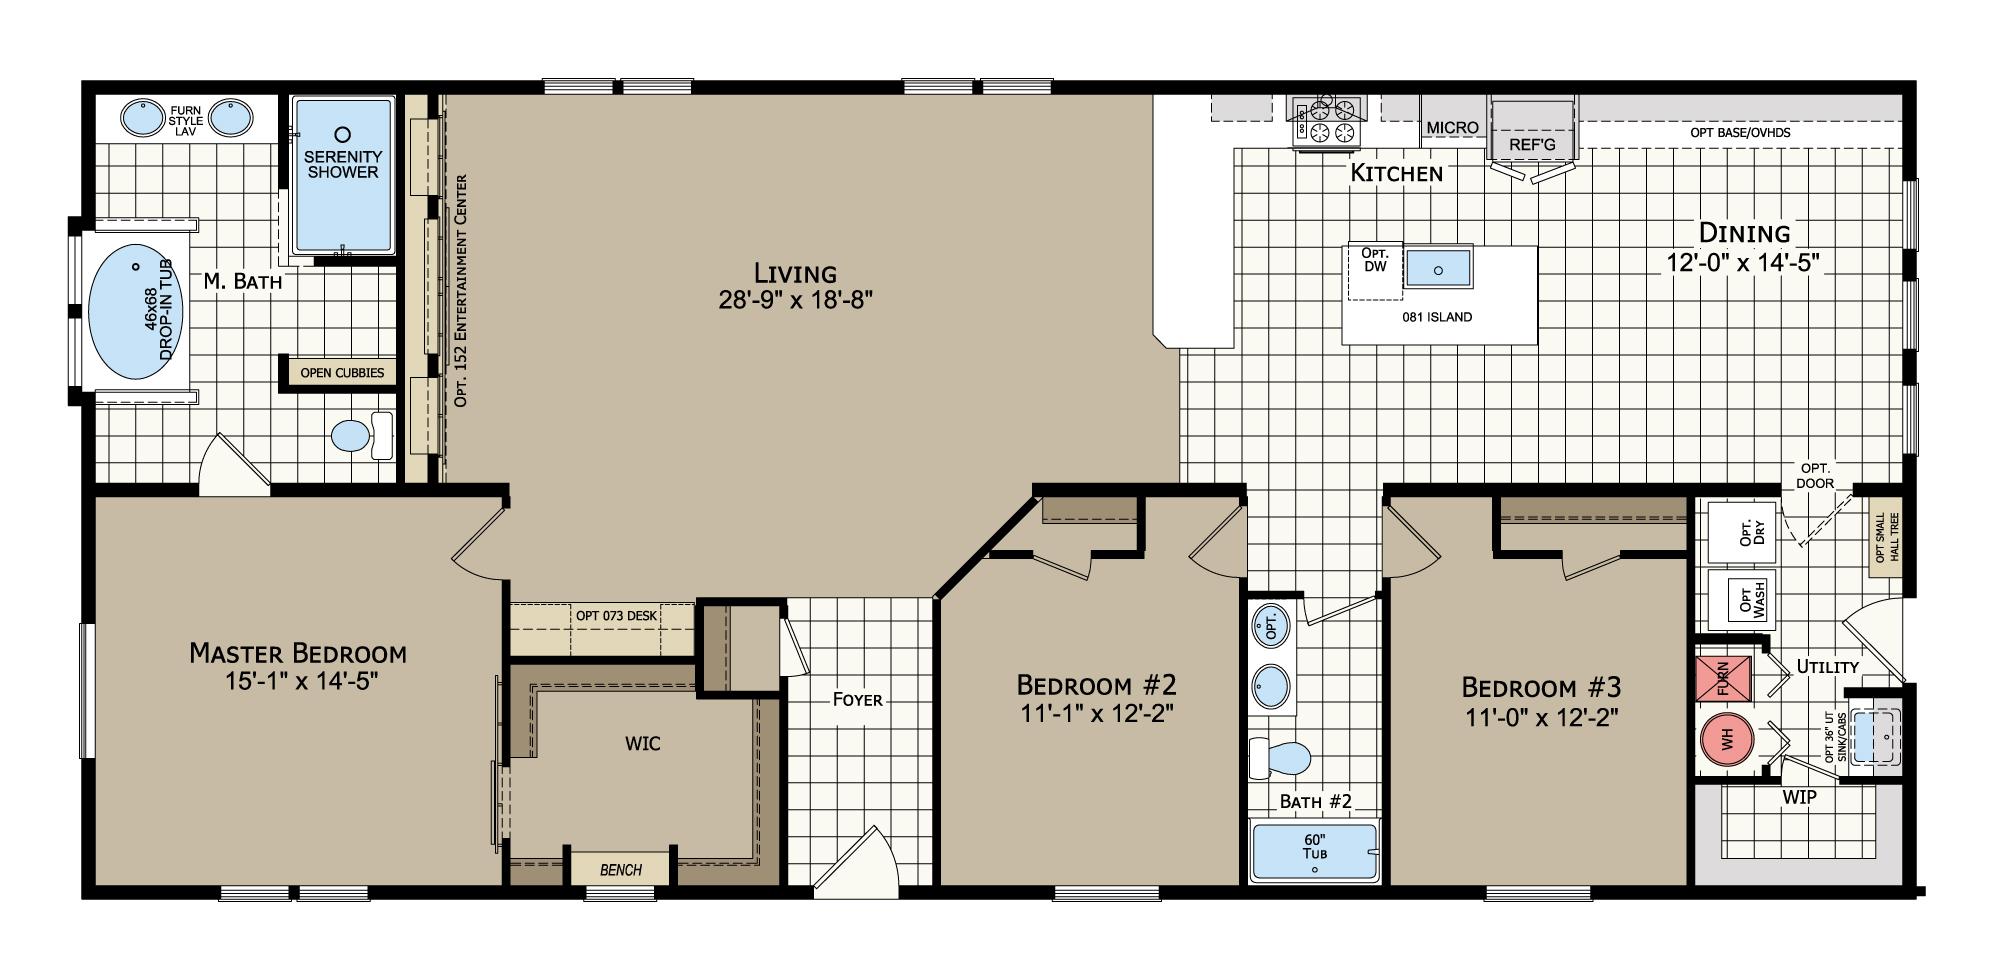 floorplan image for unit 354